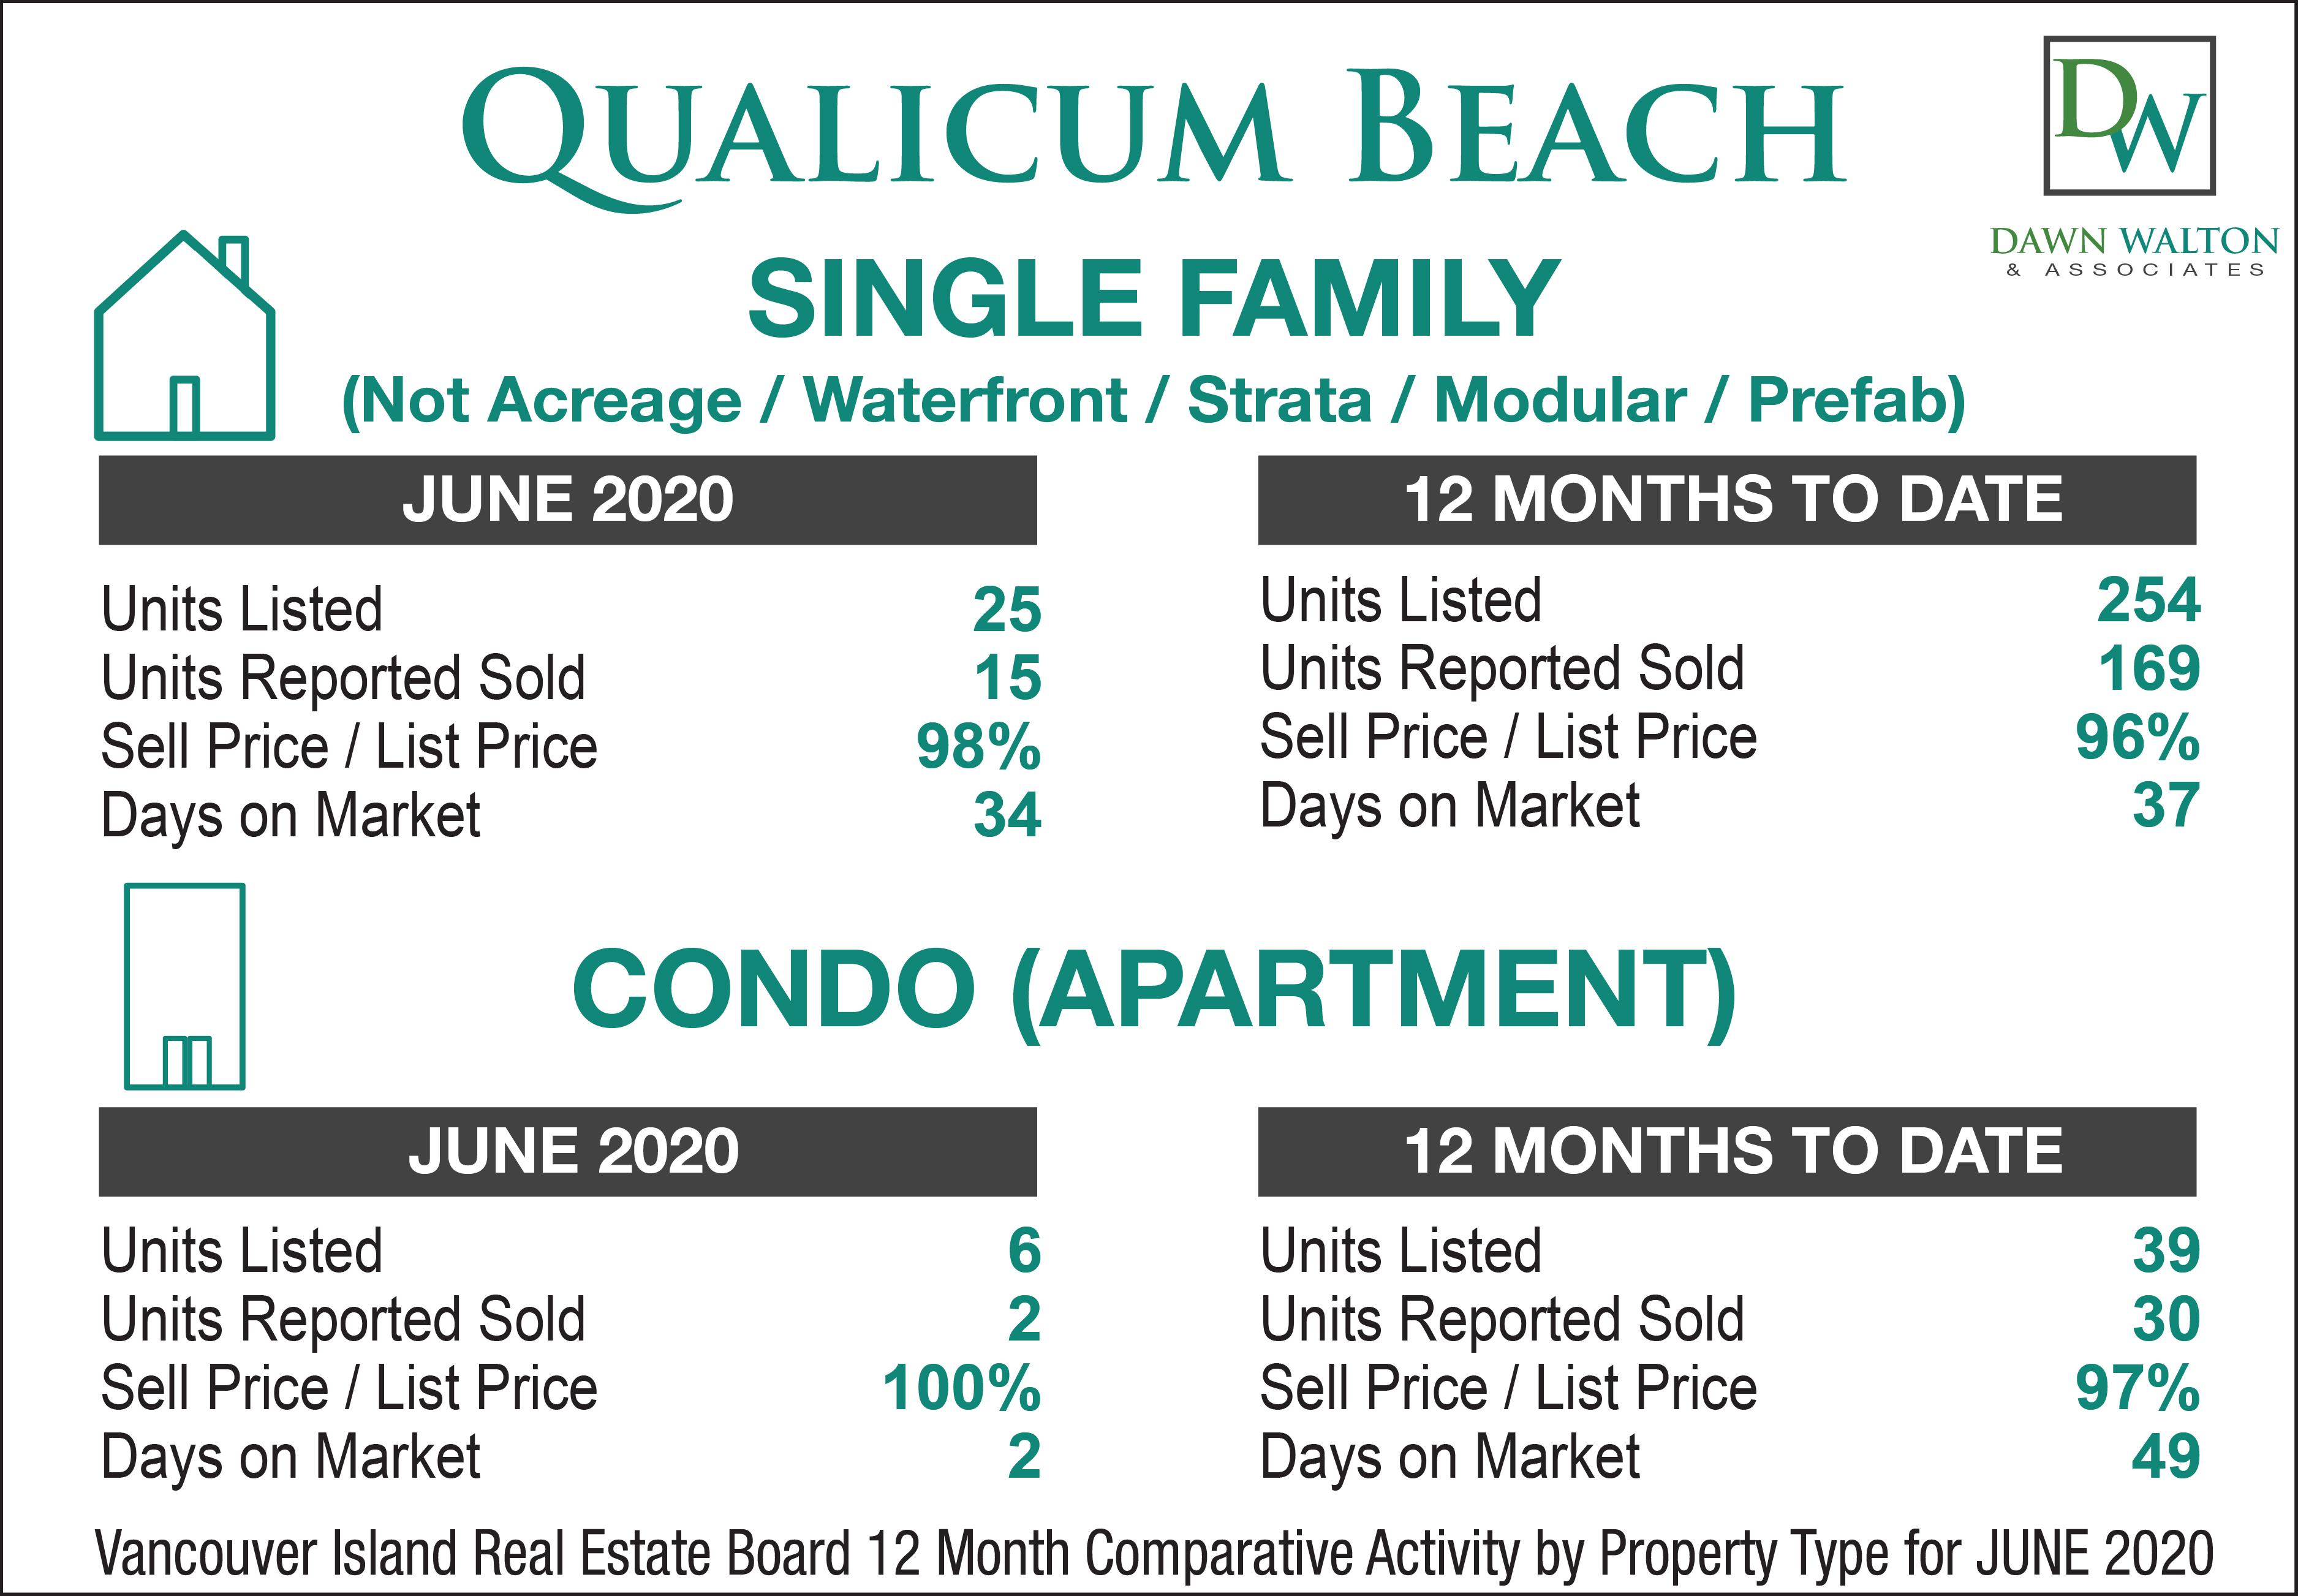 Qualicum Beach Real Estate Market Stats June 2020 - Nanaimo Realtor Dawn Walton